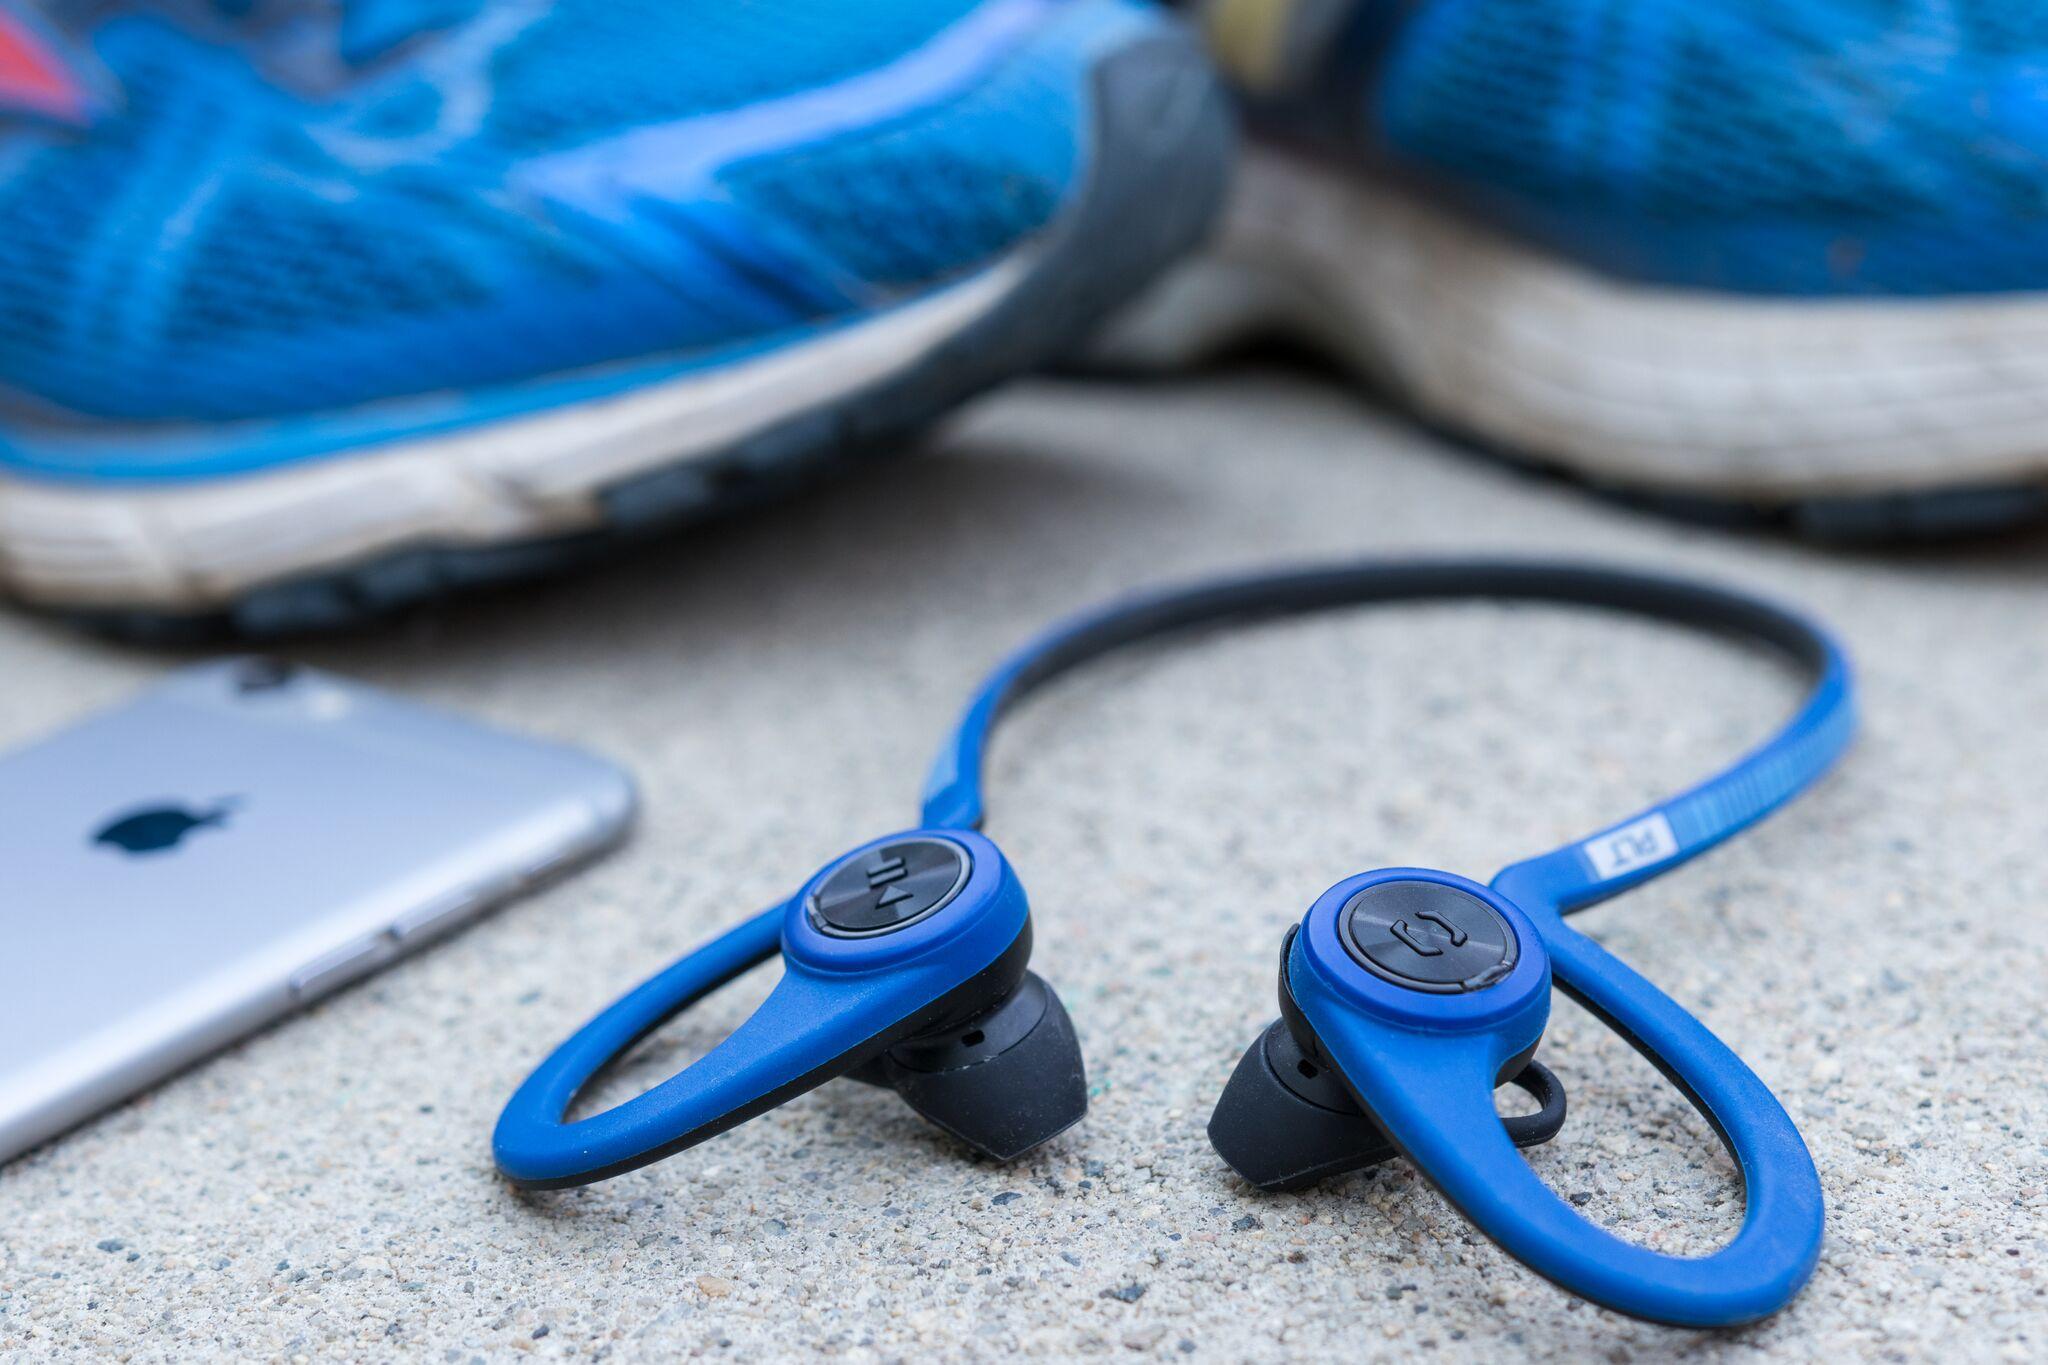 Gear for making outdoor fitness more enjoyable running headphones fullres 1424 preview